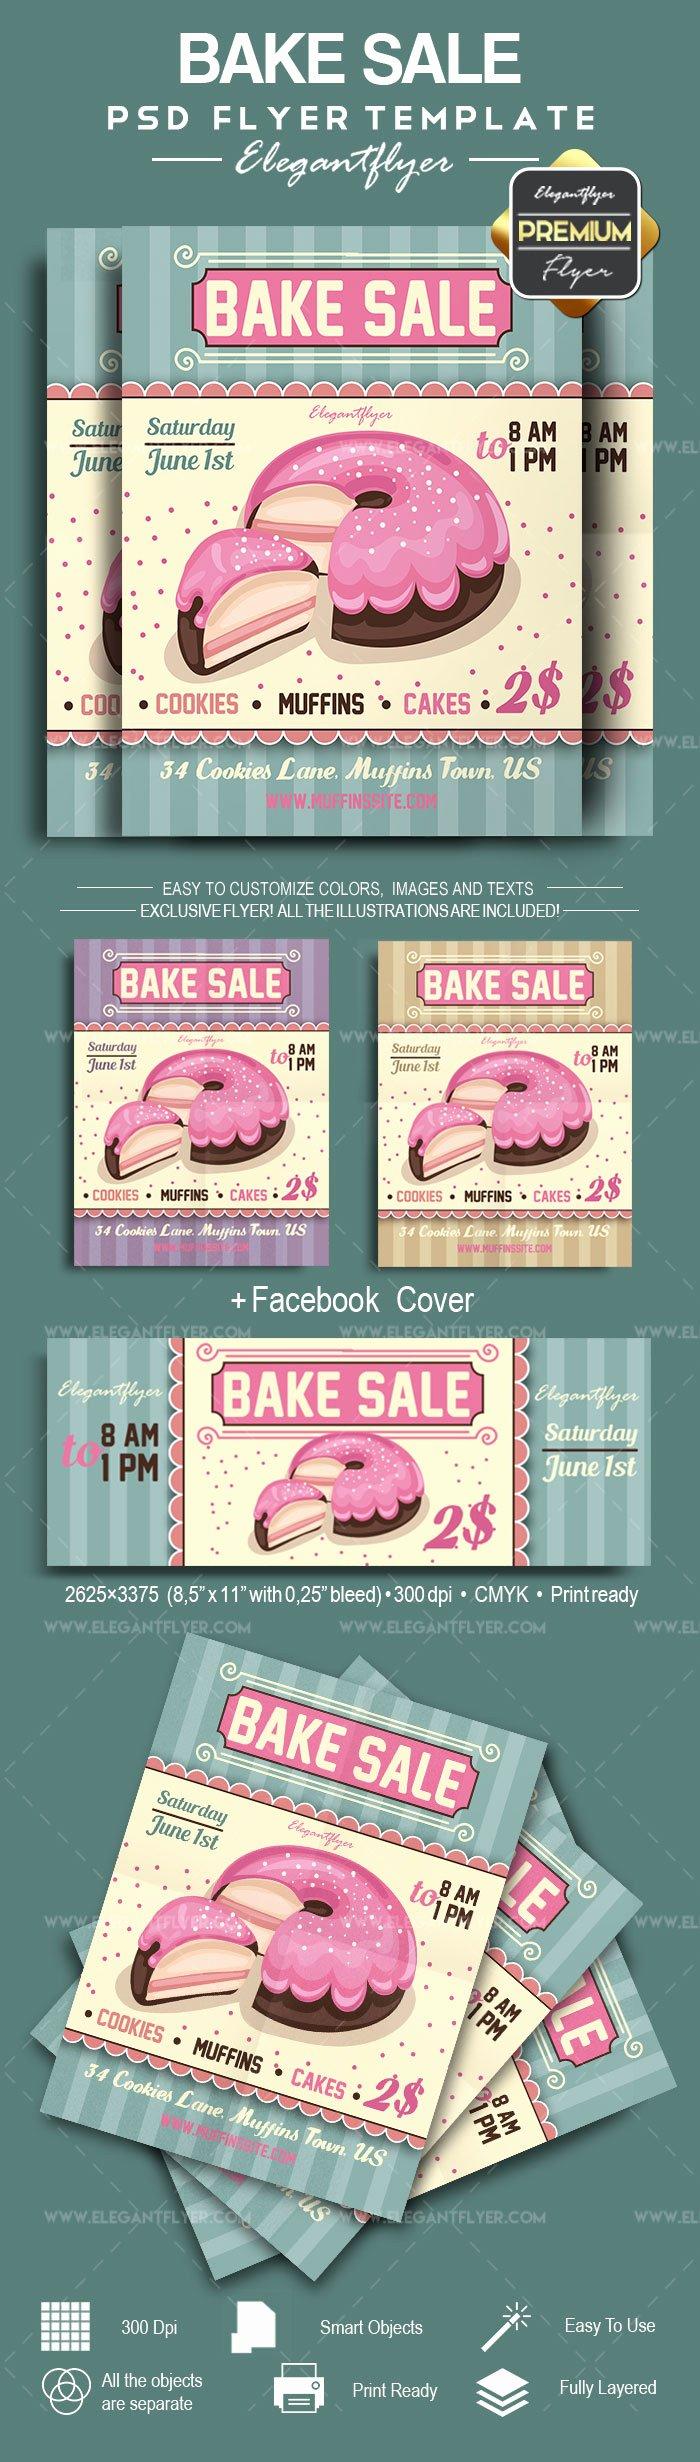 Bake Sale Flyer Template Awesome Cupcake Bake Sale Psd Flyer – by Elegantflyer